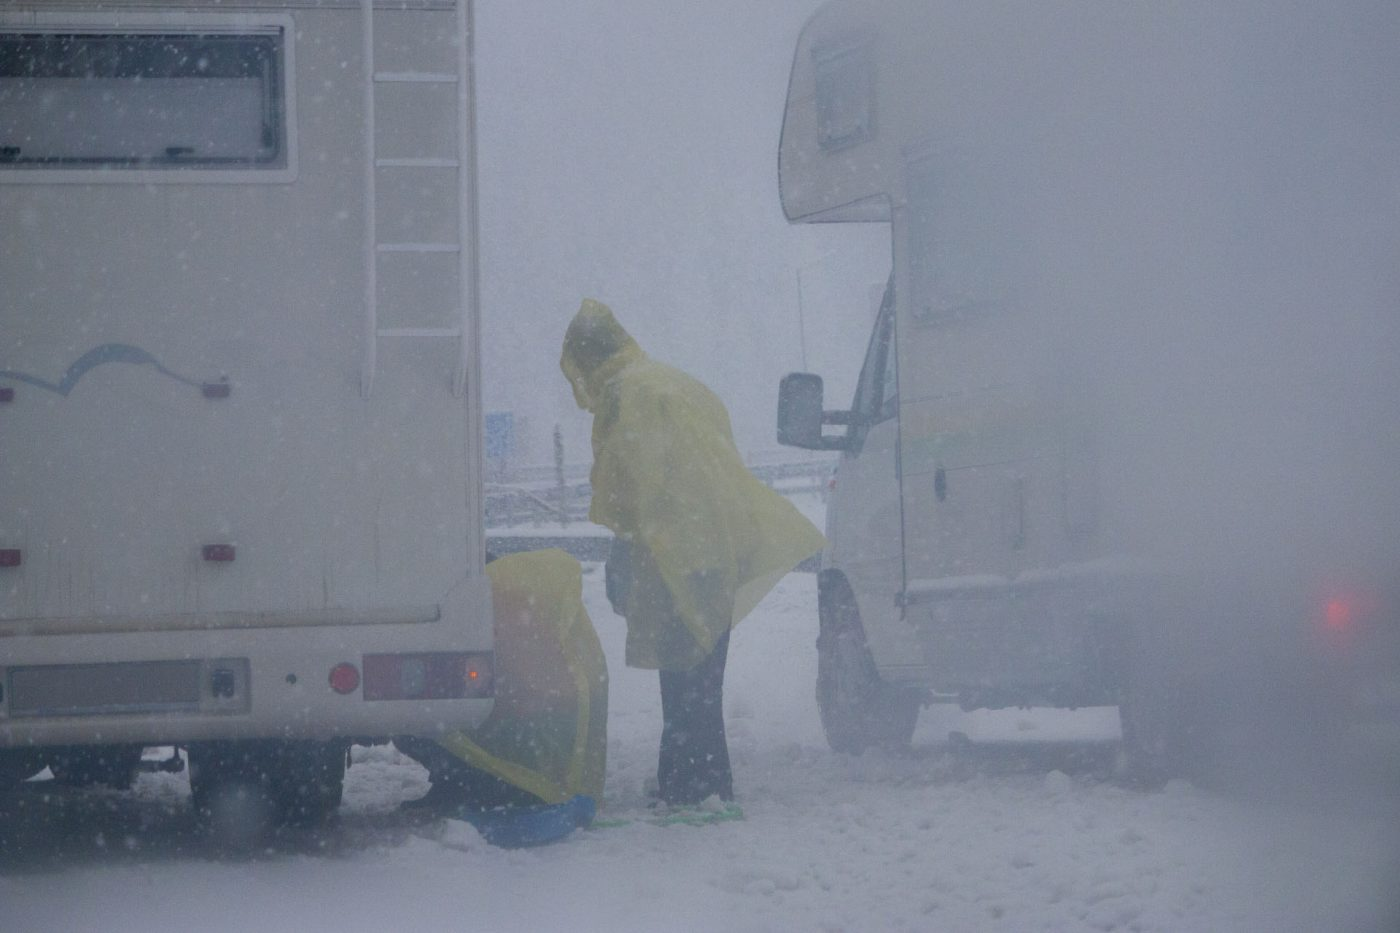 Motorhome repair in snow